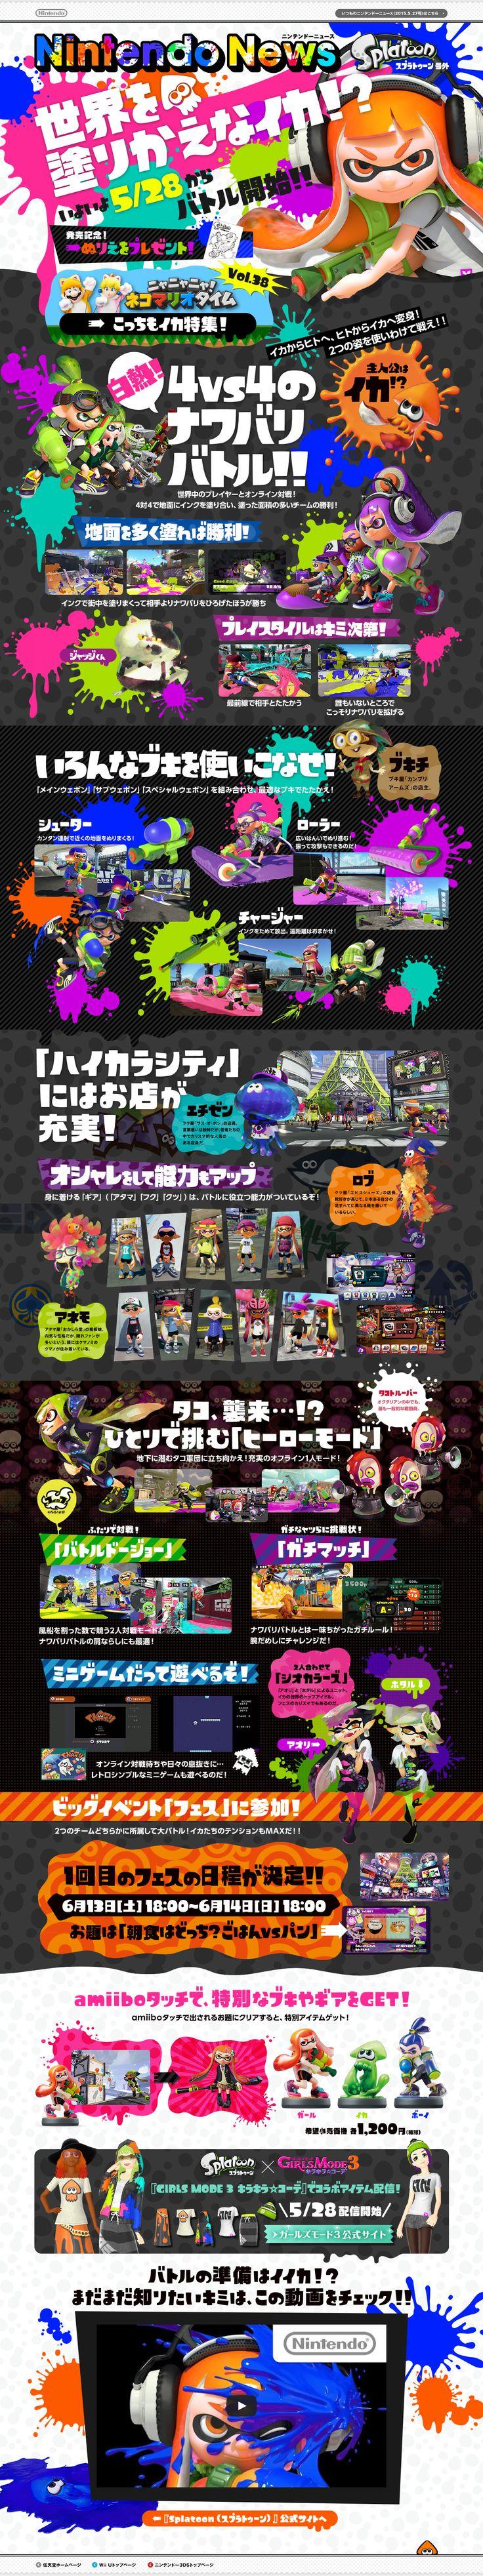 http://www.nintendo.co.jp/nintendo_news/150527/splatoon/index.html